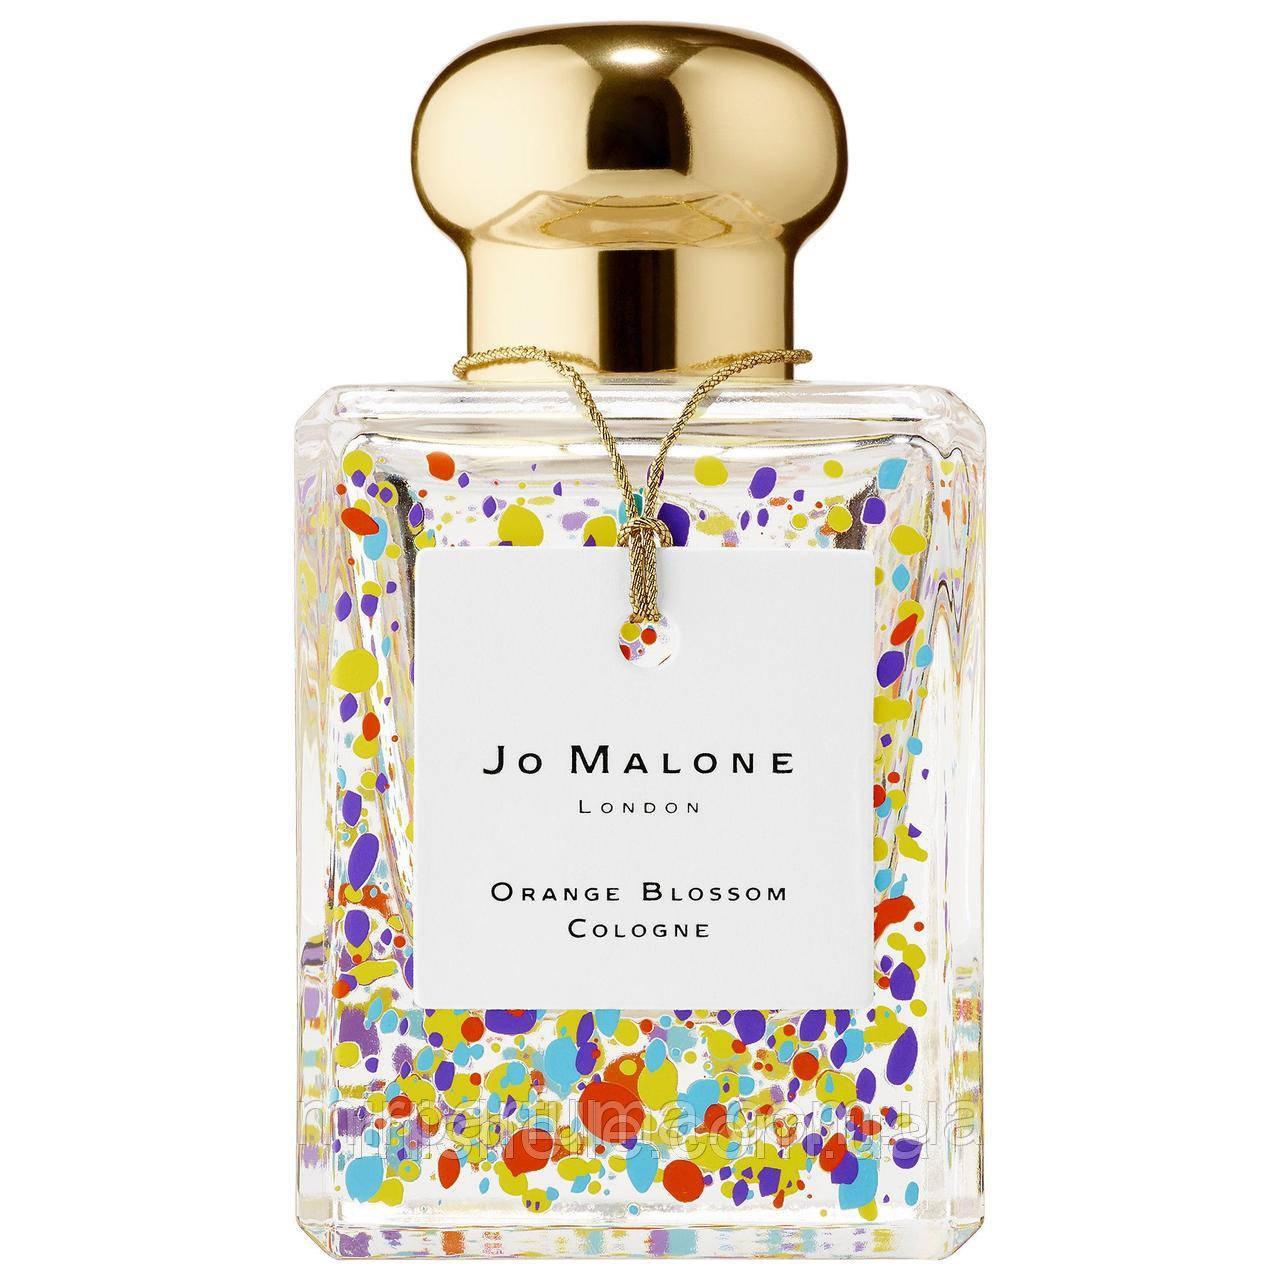 Женский парфюм Jo Malone Orange Blossom Cologne Intense Джо Малон Оранж Блоссом Кологен Интенс 100 мл